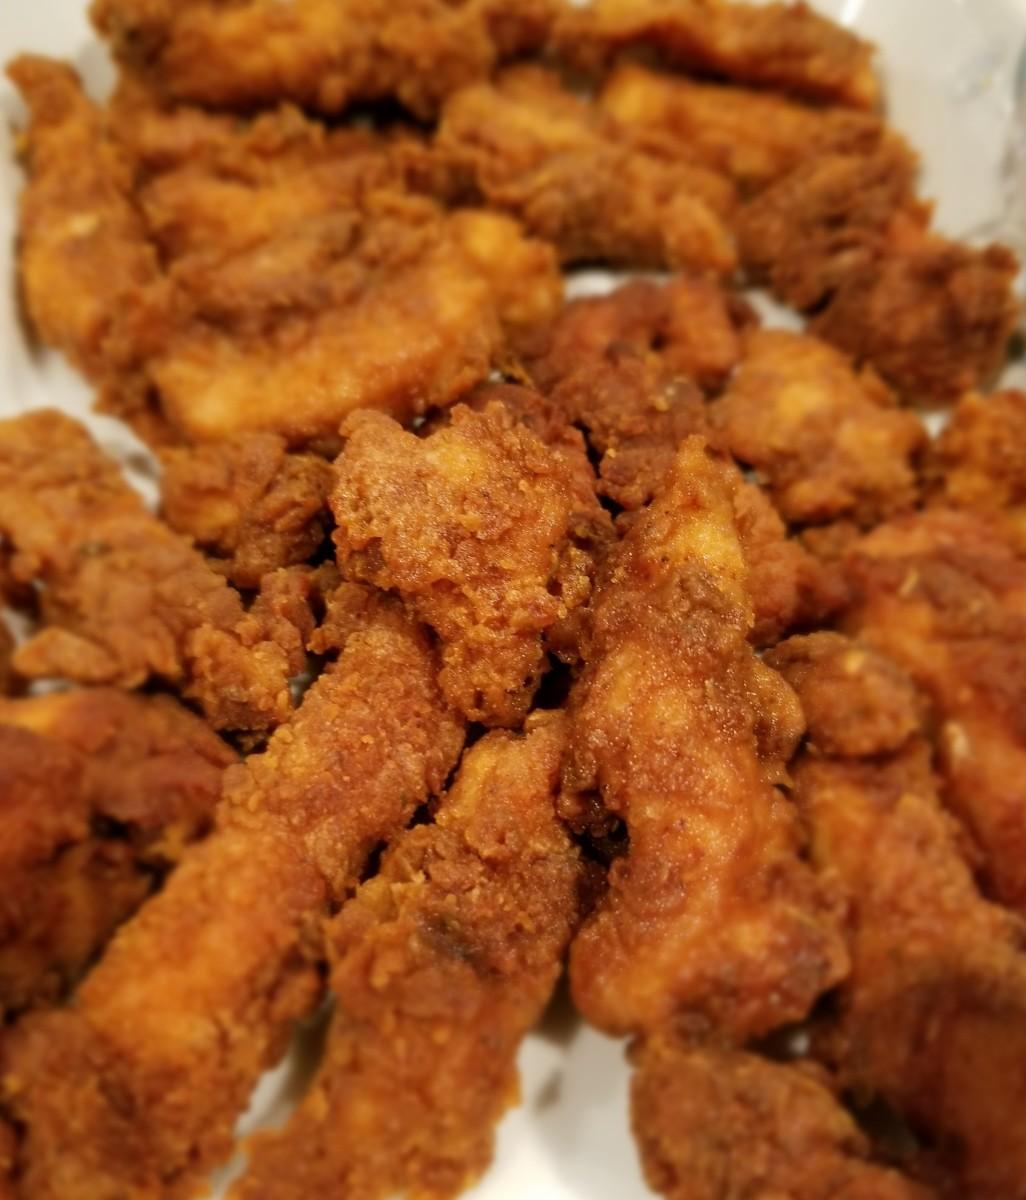 Chef David's Crispy Chicken Fries